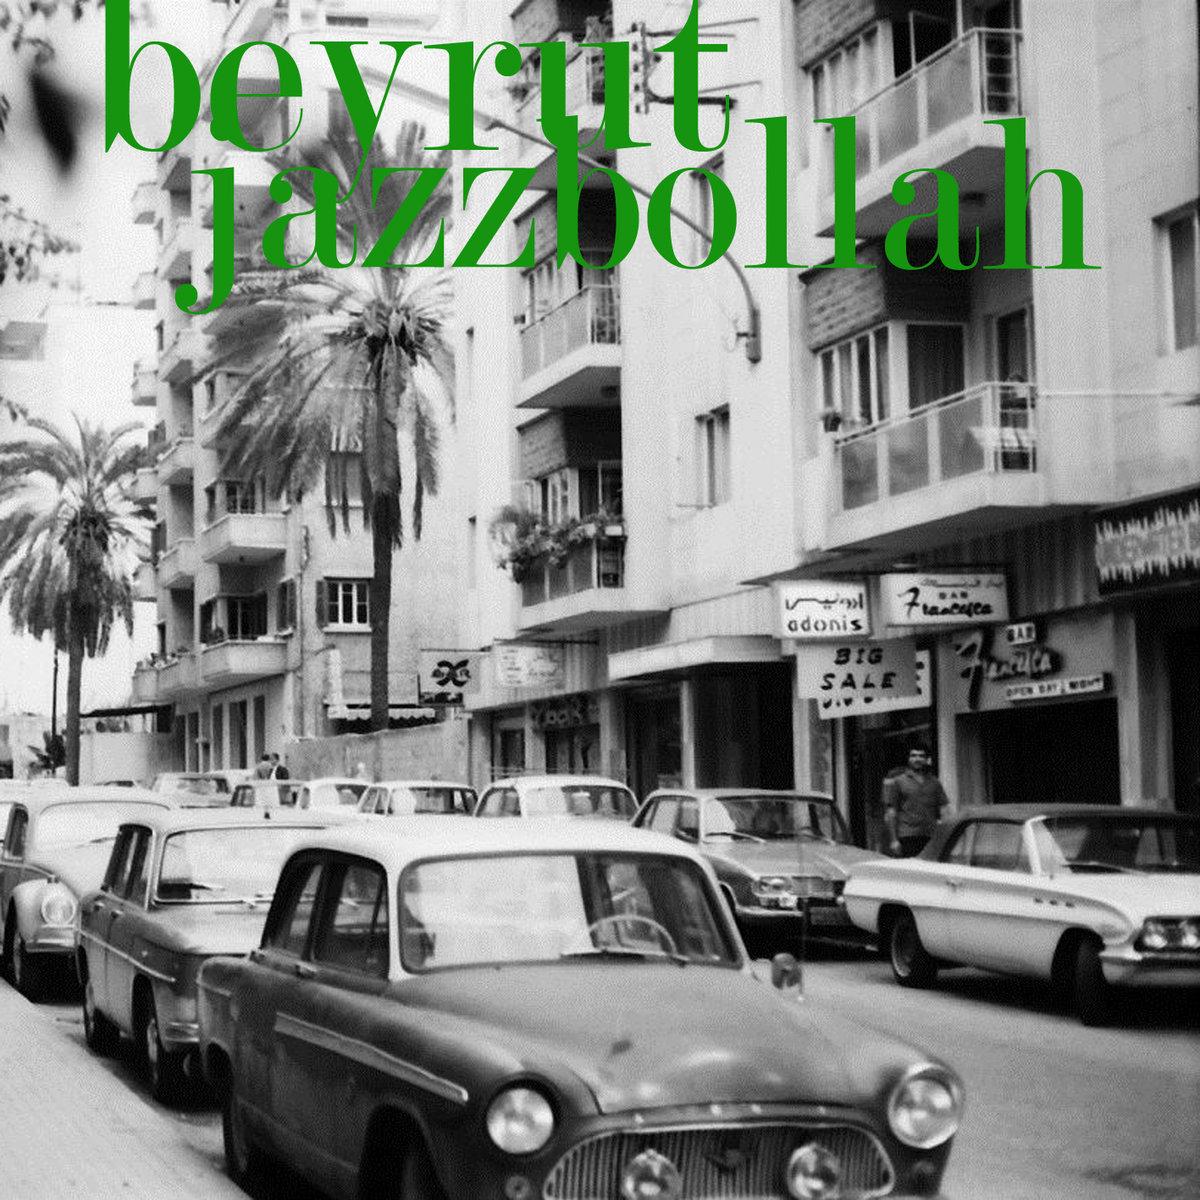 Beyrut: Jazzbollah LP